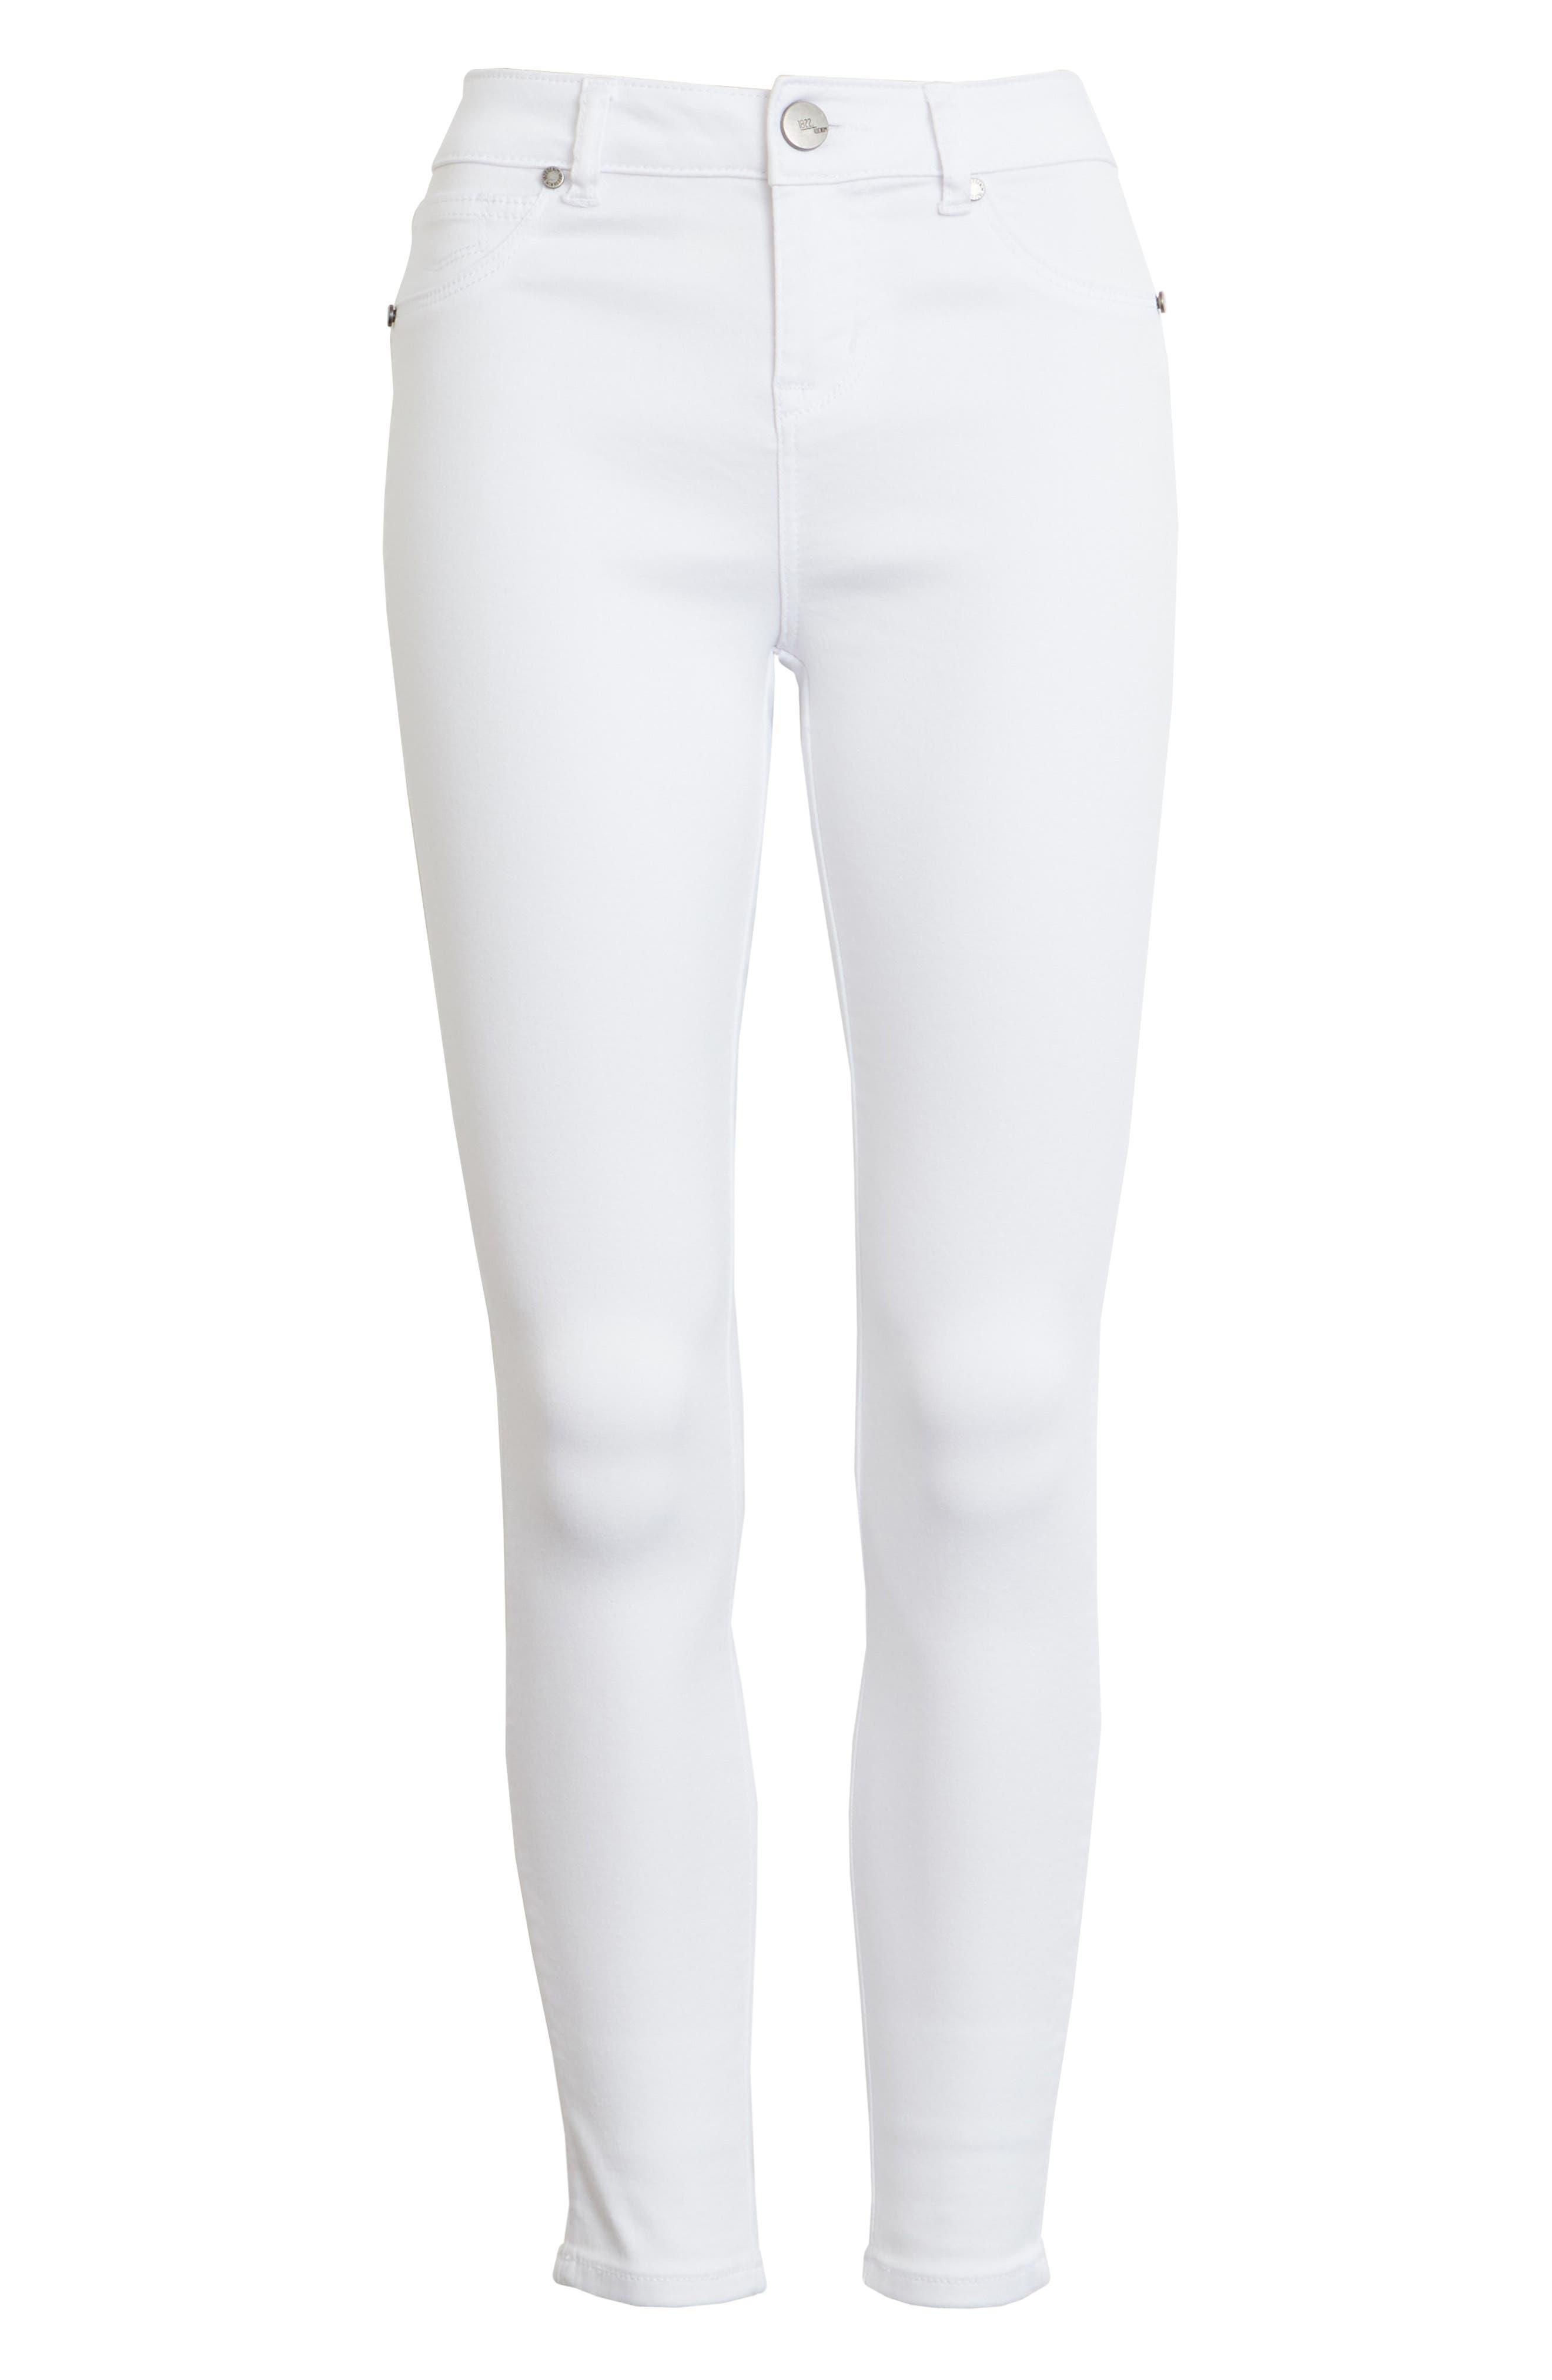 Women's 1822 Denim Butter High Waist Ankle Skinny Jeans